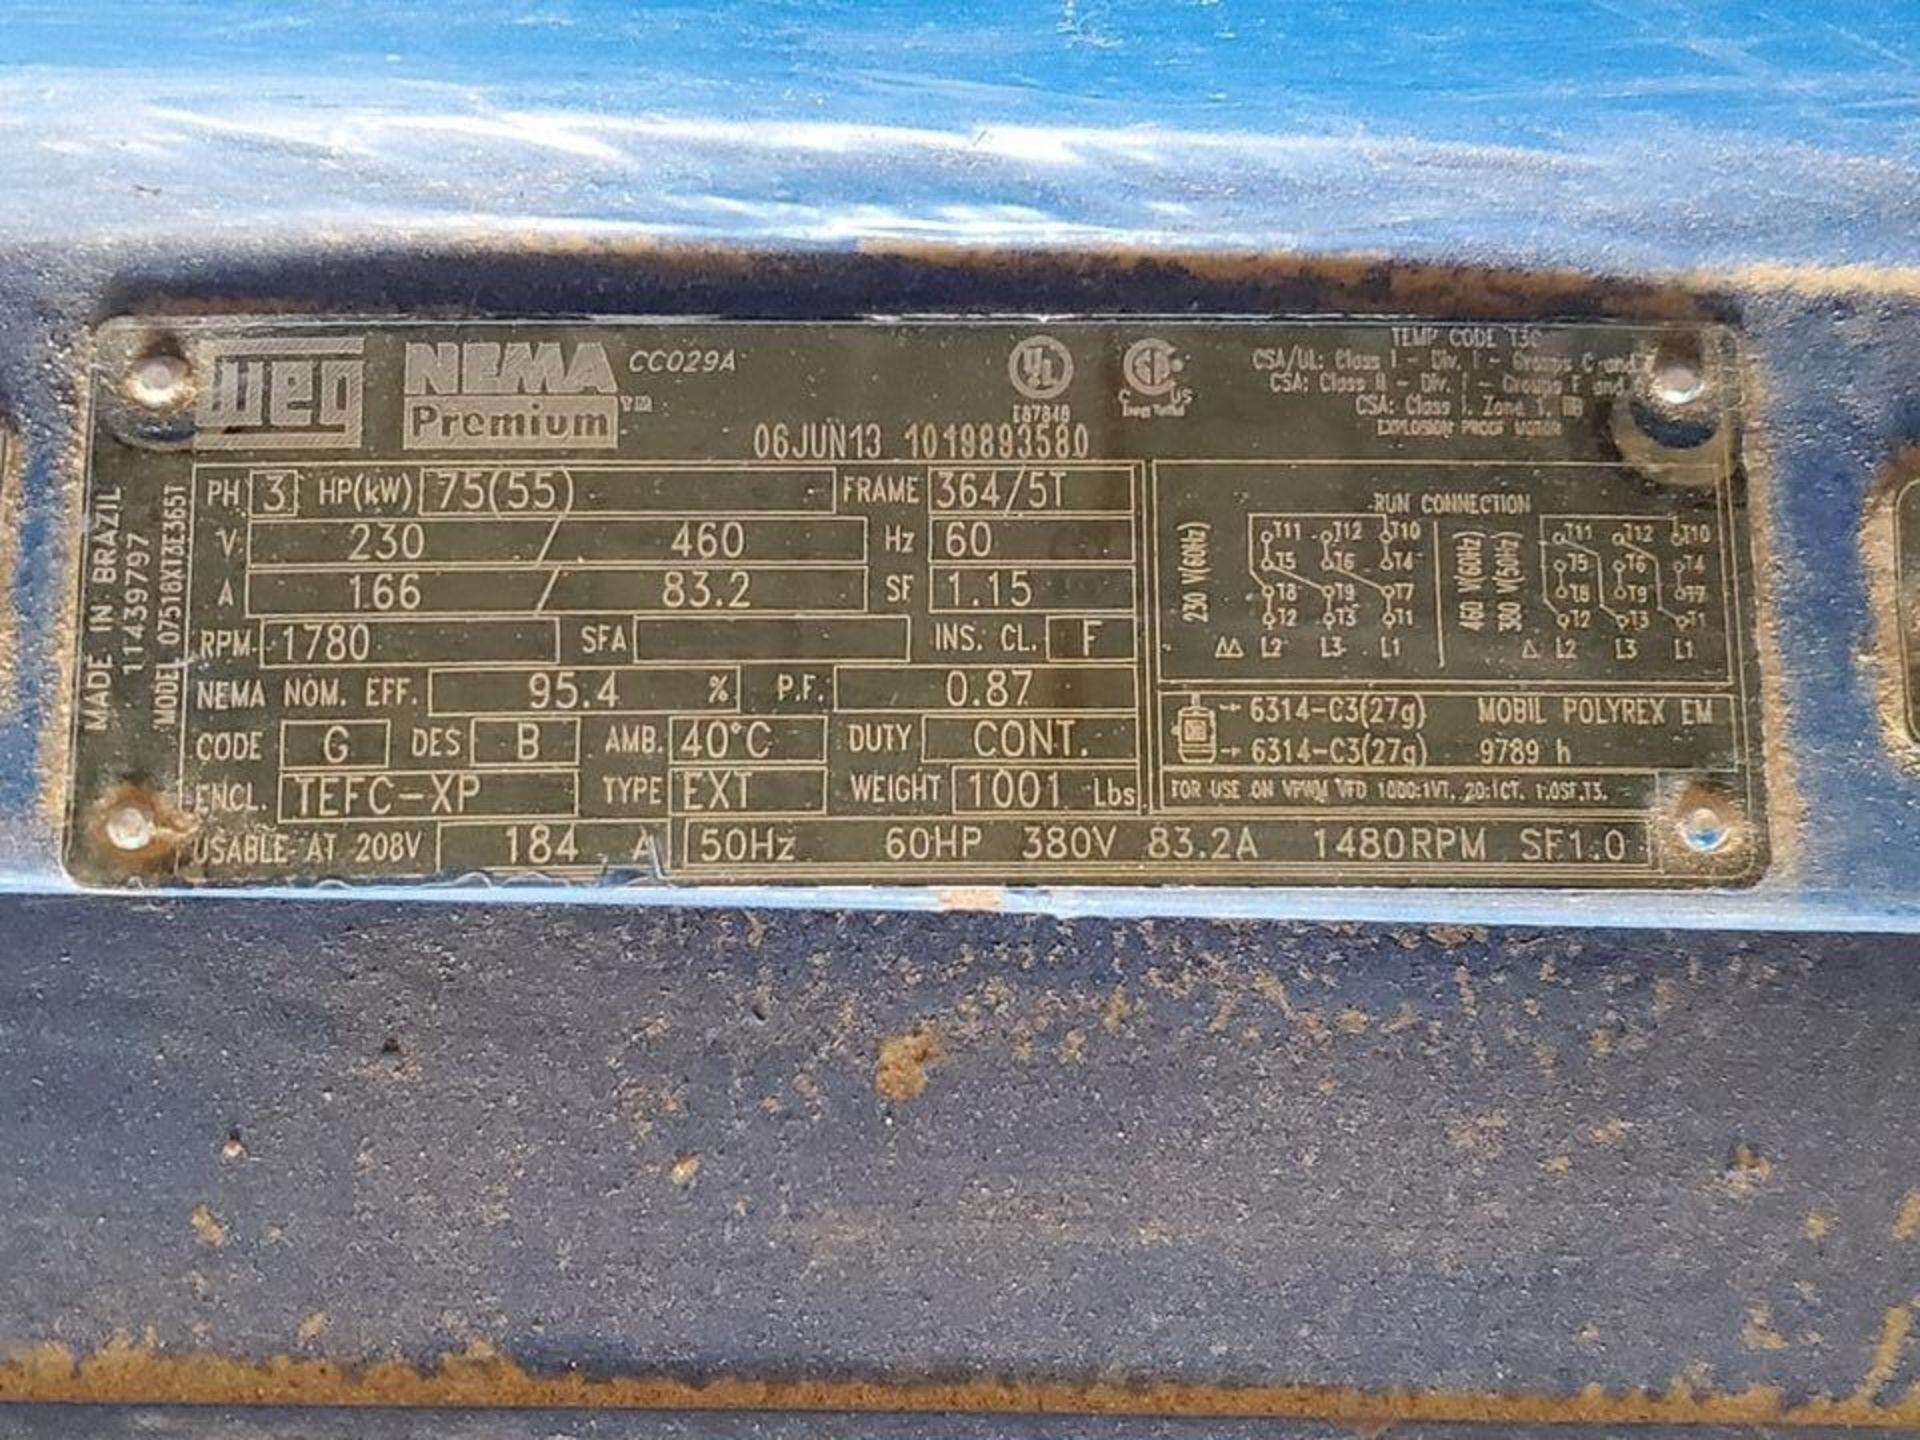 "2013 Ace 250X Series 5x6x1 Centrifugal Pump Imp Dia: 11"" RH, -20C-65C; W/ 75HP Weg Motor, 1780RPM, - Image 7 of 7"